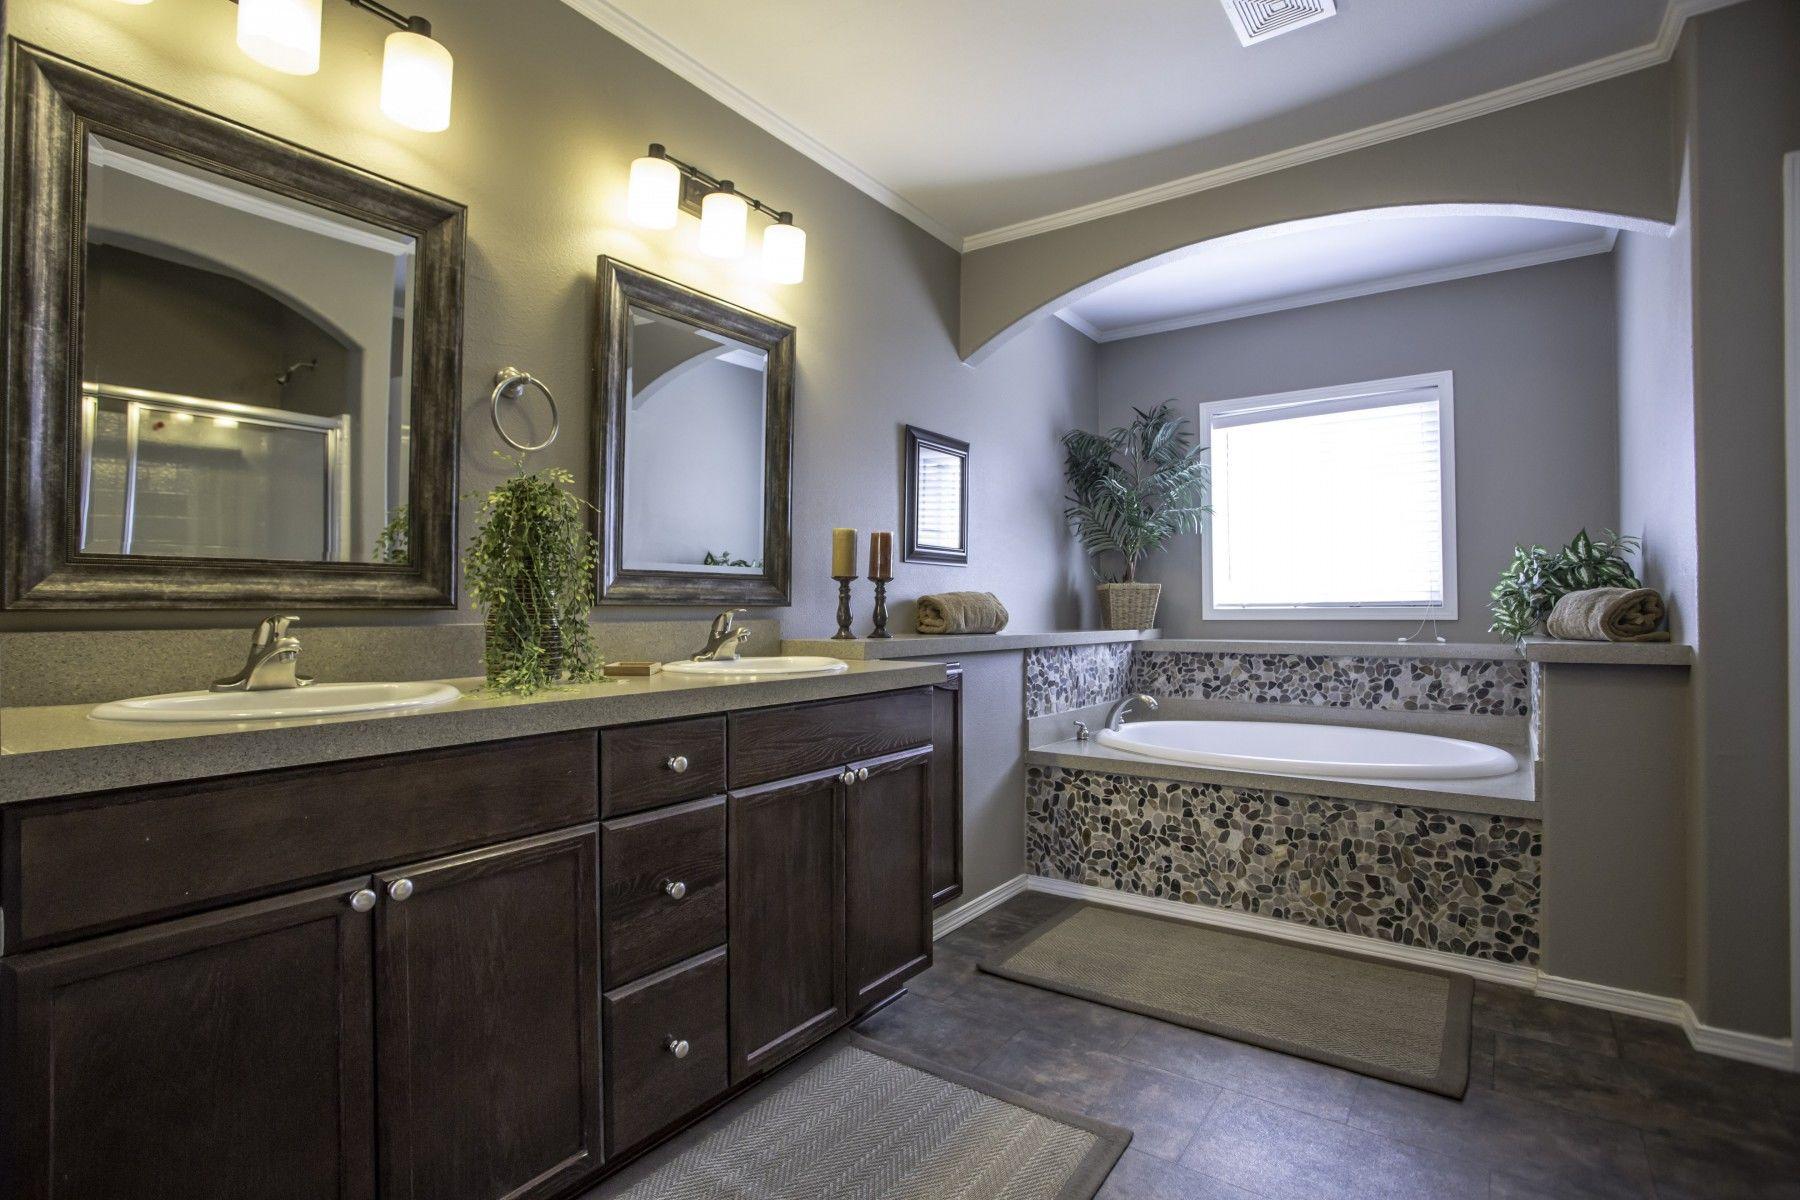 Customization Option for Bathroom of Your Manufactured ... on Model Bathroom Ideas  id=75726